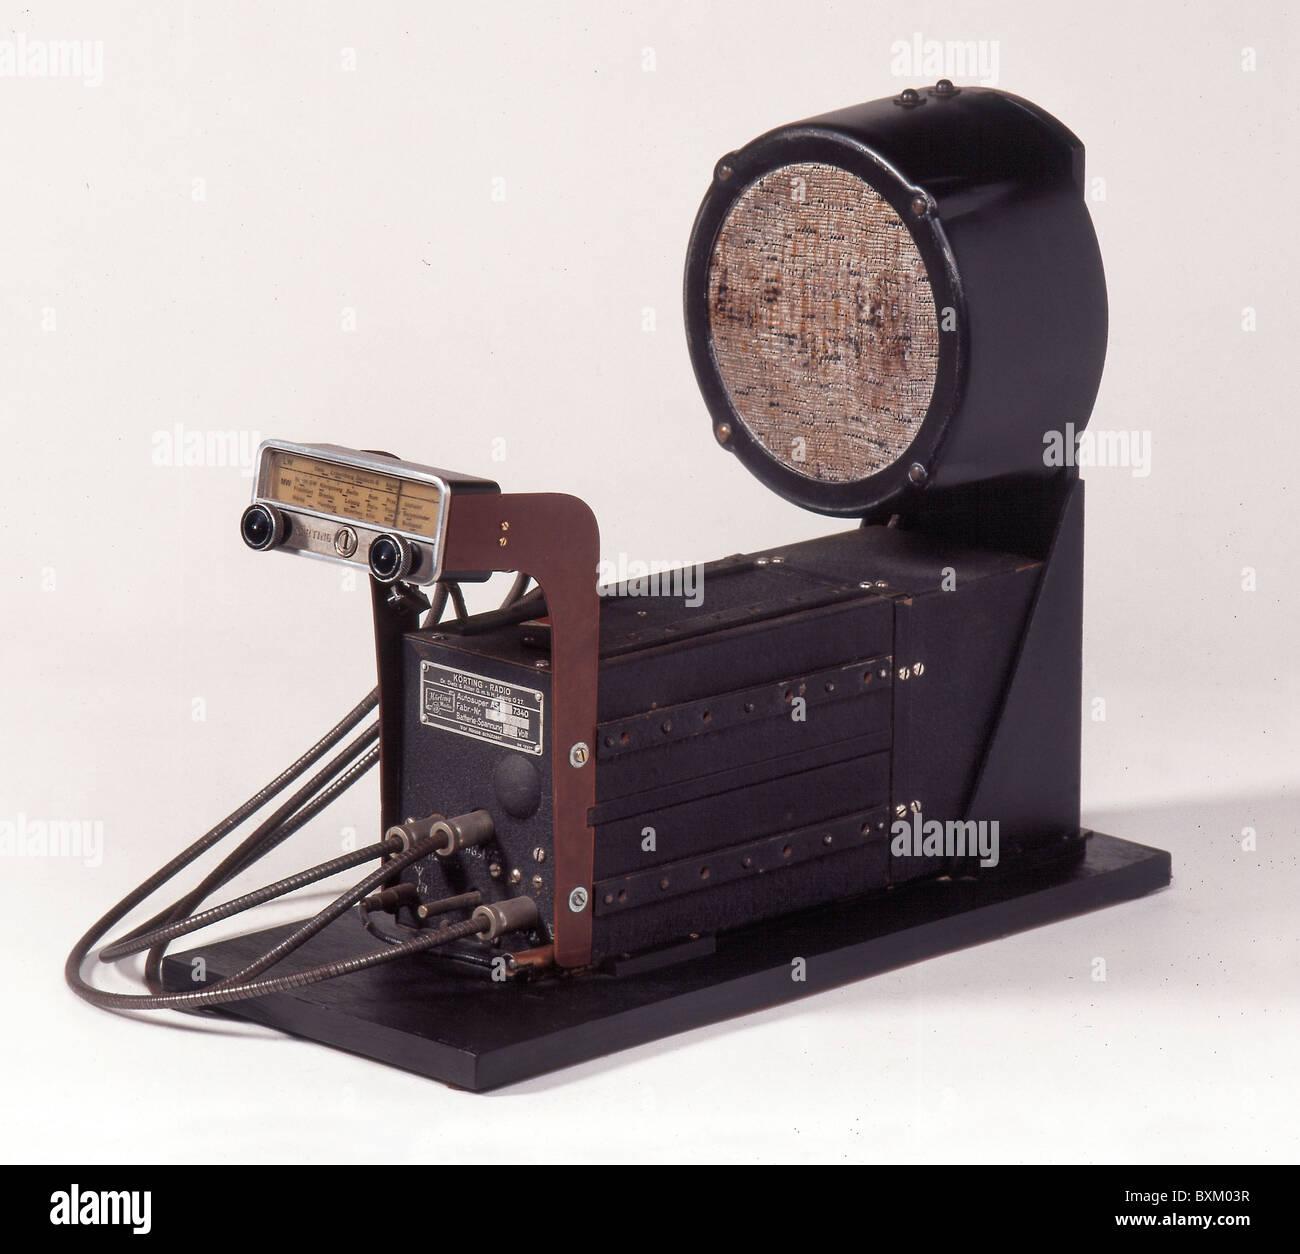 Broadcast, radio, radio Koerting como 7340, Alemania, 1939, 1930s, 30s, siglo xx, histórico, histórico, Imagen De Stock